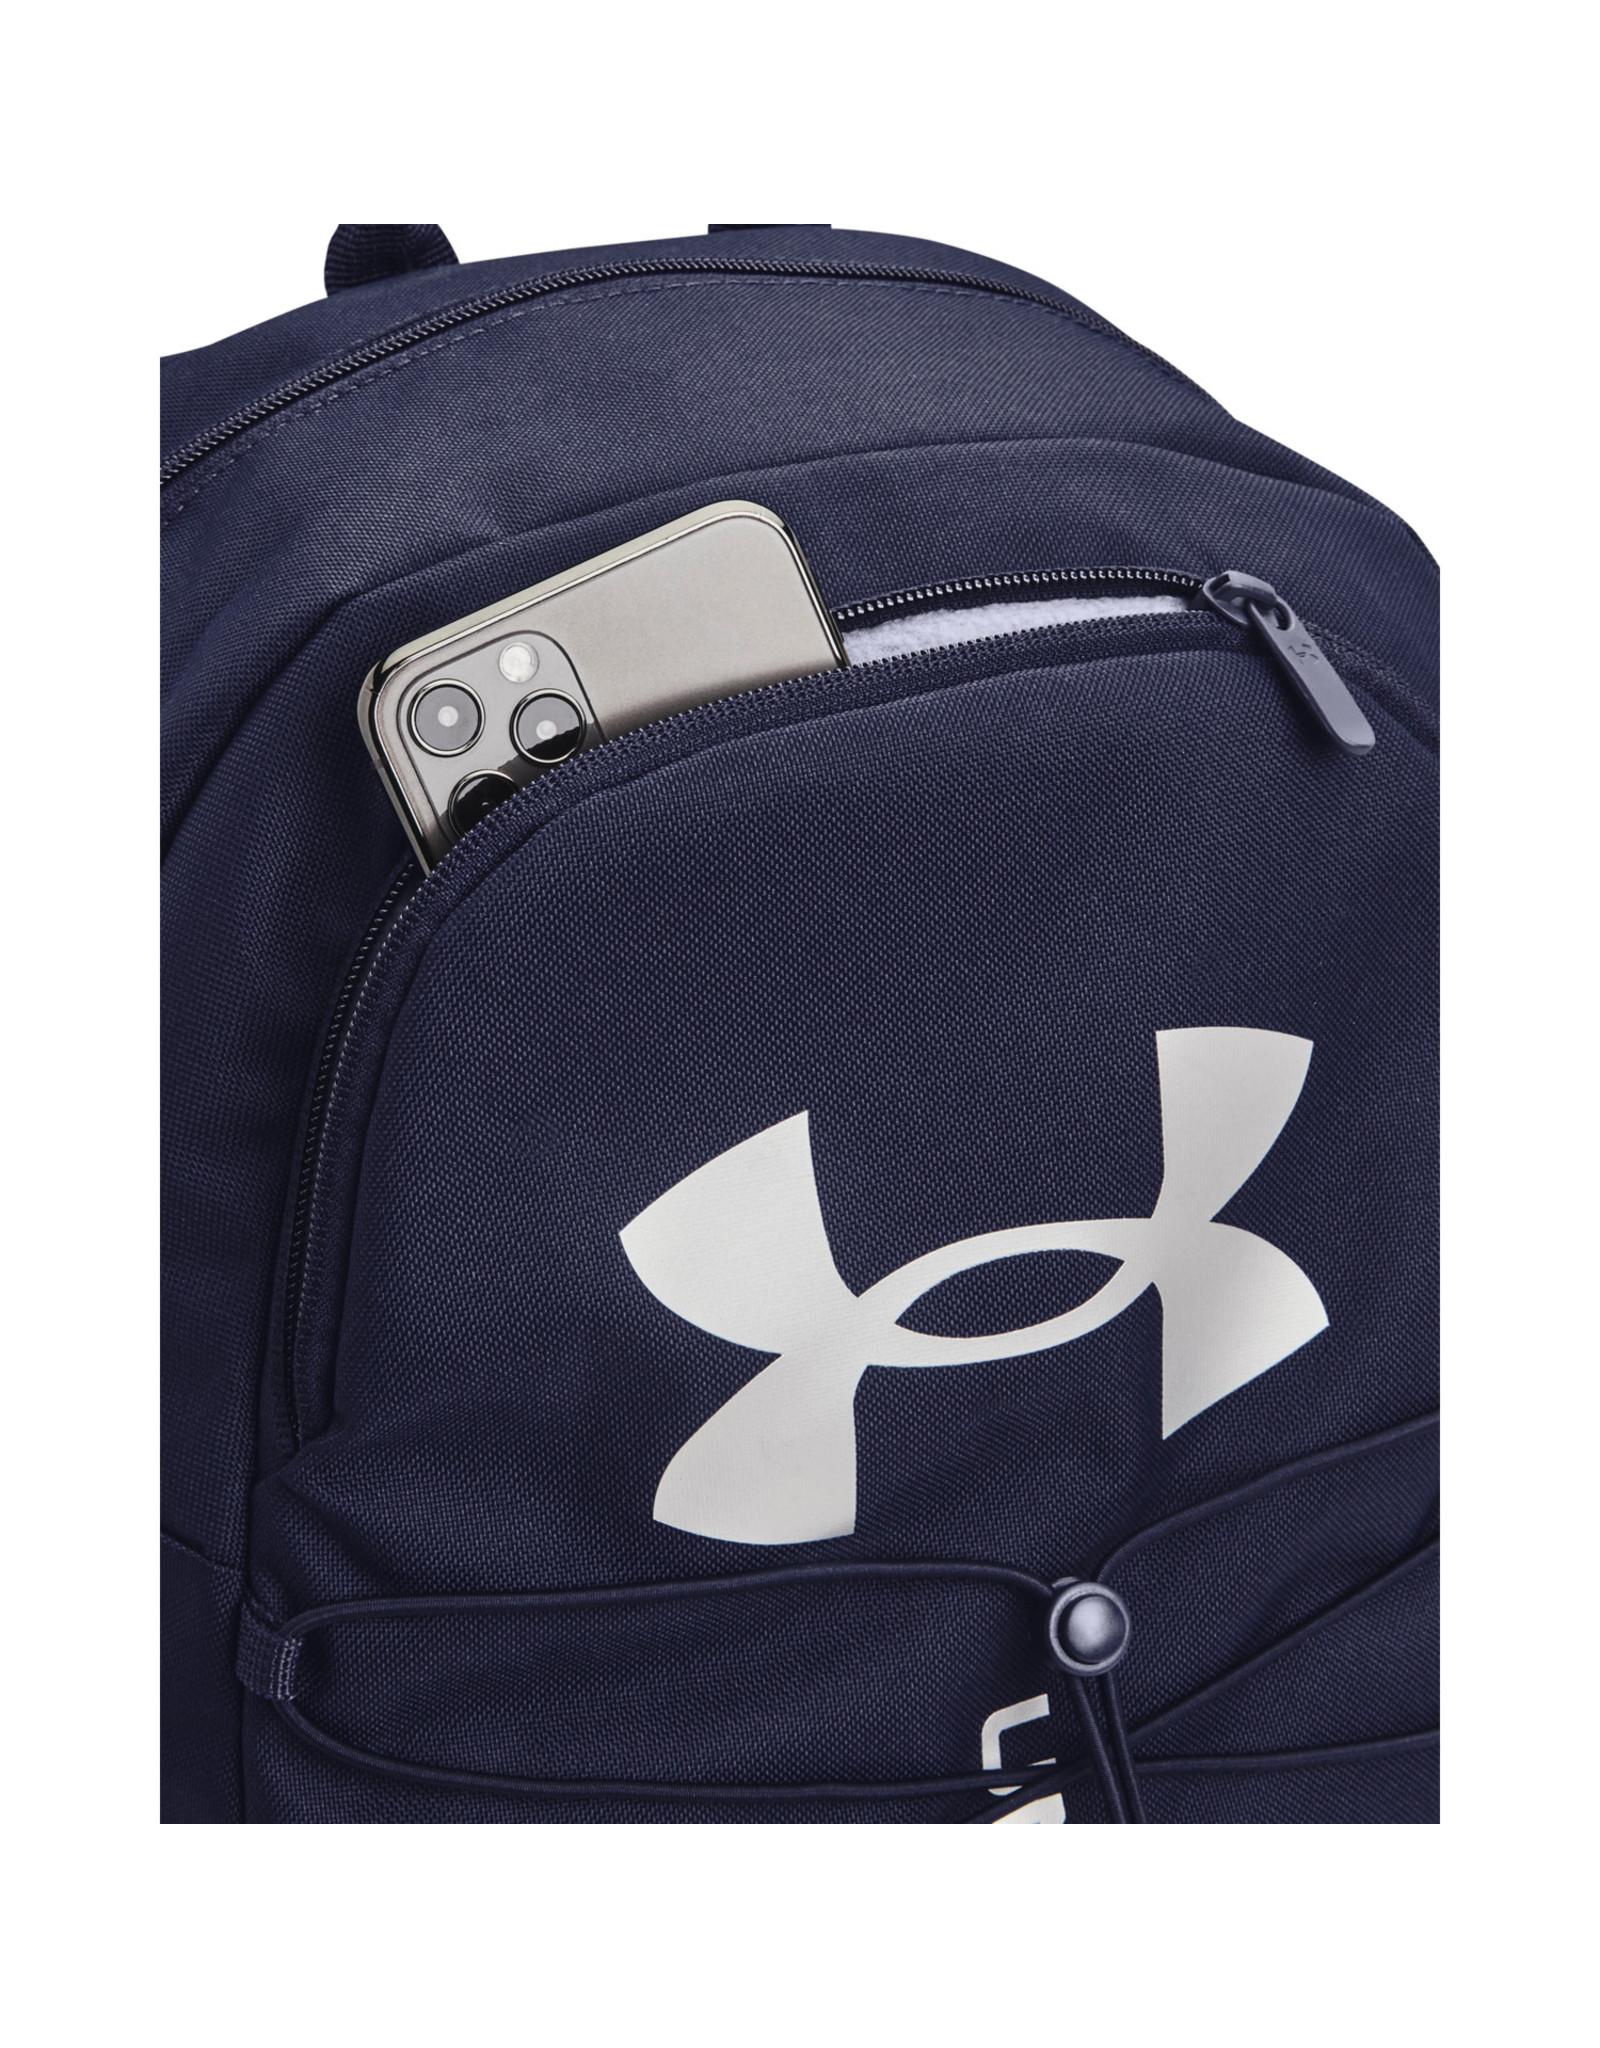 Under Armour UA Hustle Sport Backpack-Navy